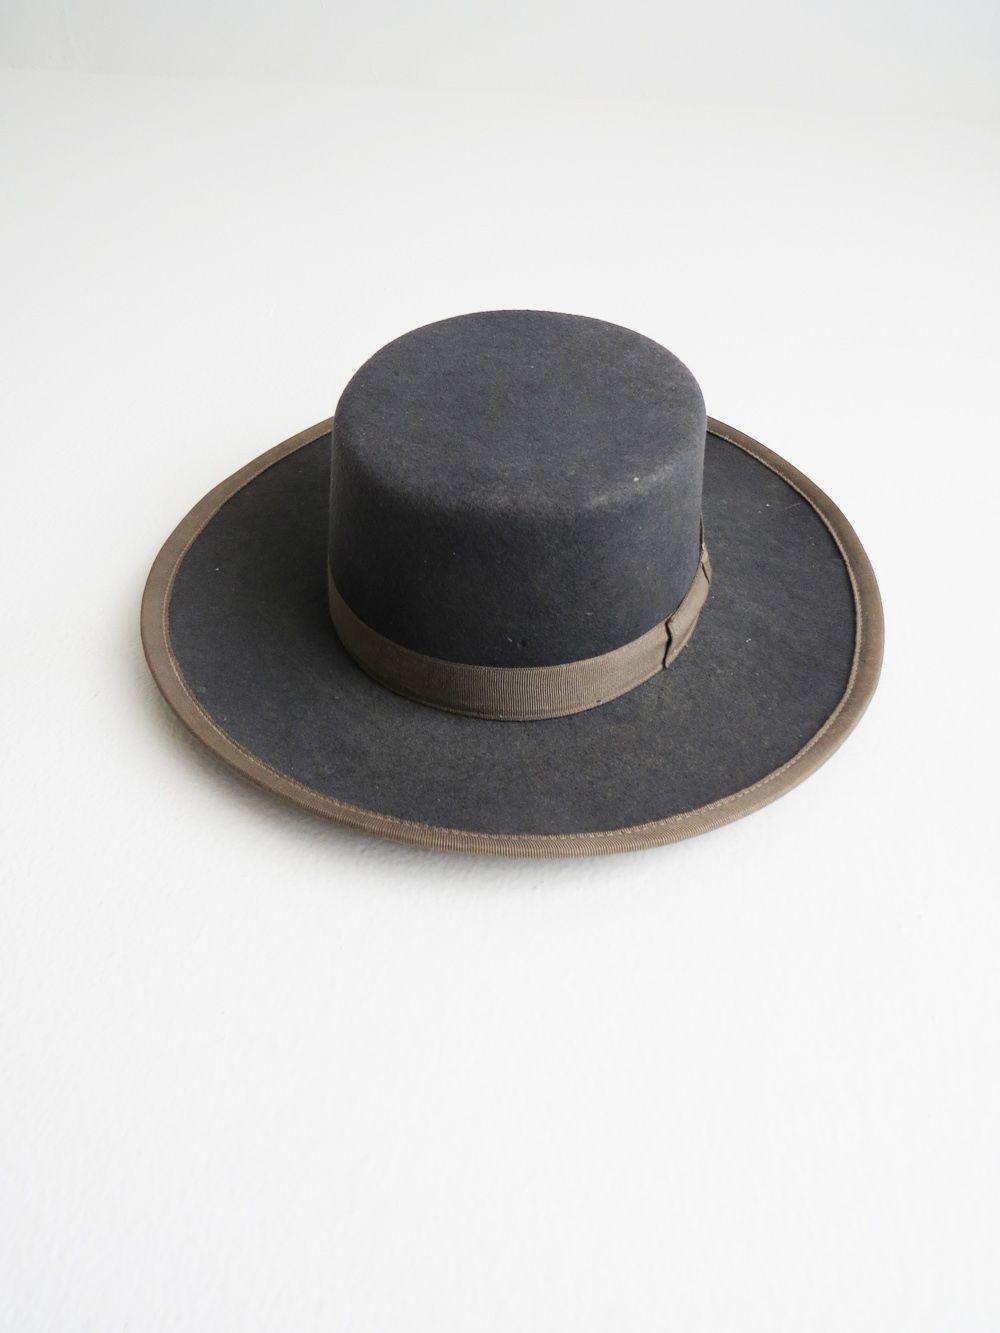 4c70f28fda75a Granada Bolero Hat // 1950's Spanish Bolero Hat SOLD | A R C H I V E ...